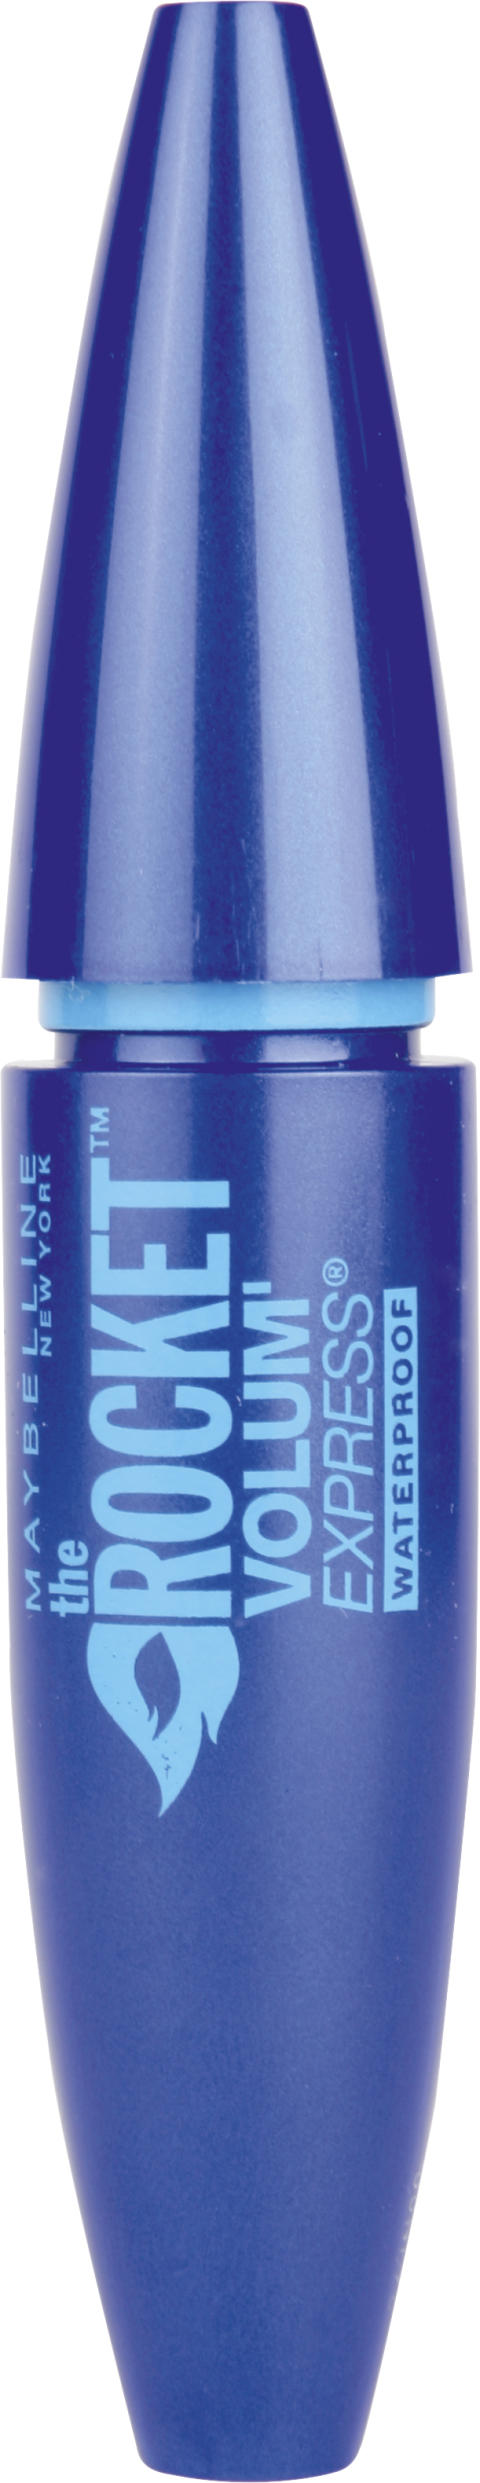 Maybelline Rocket vannfast mascara